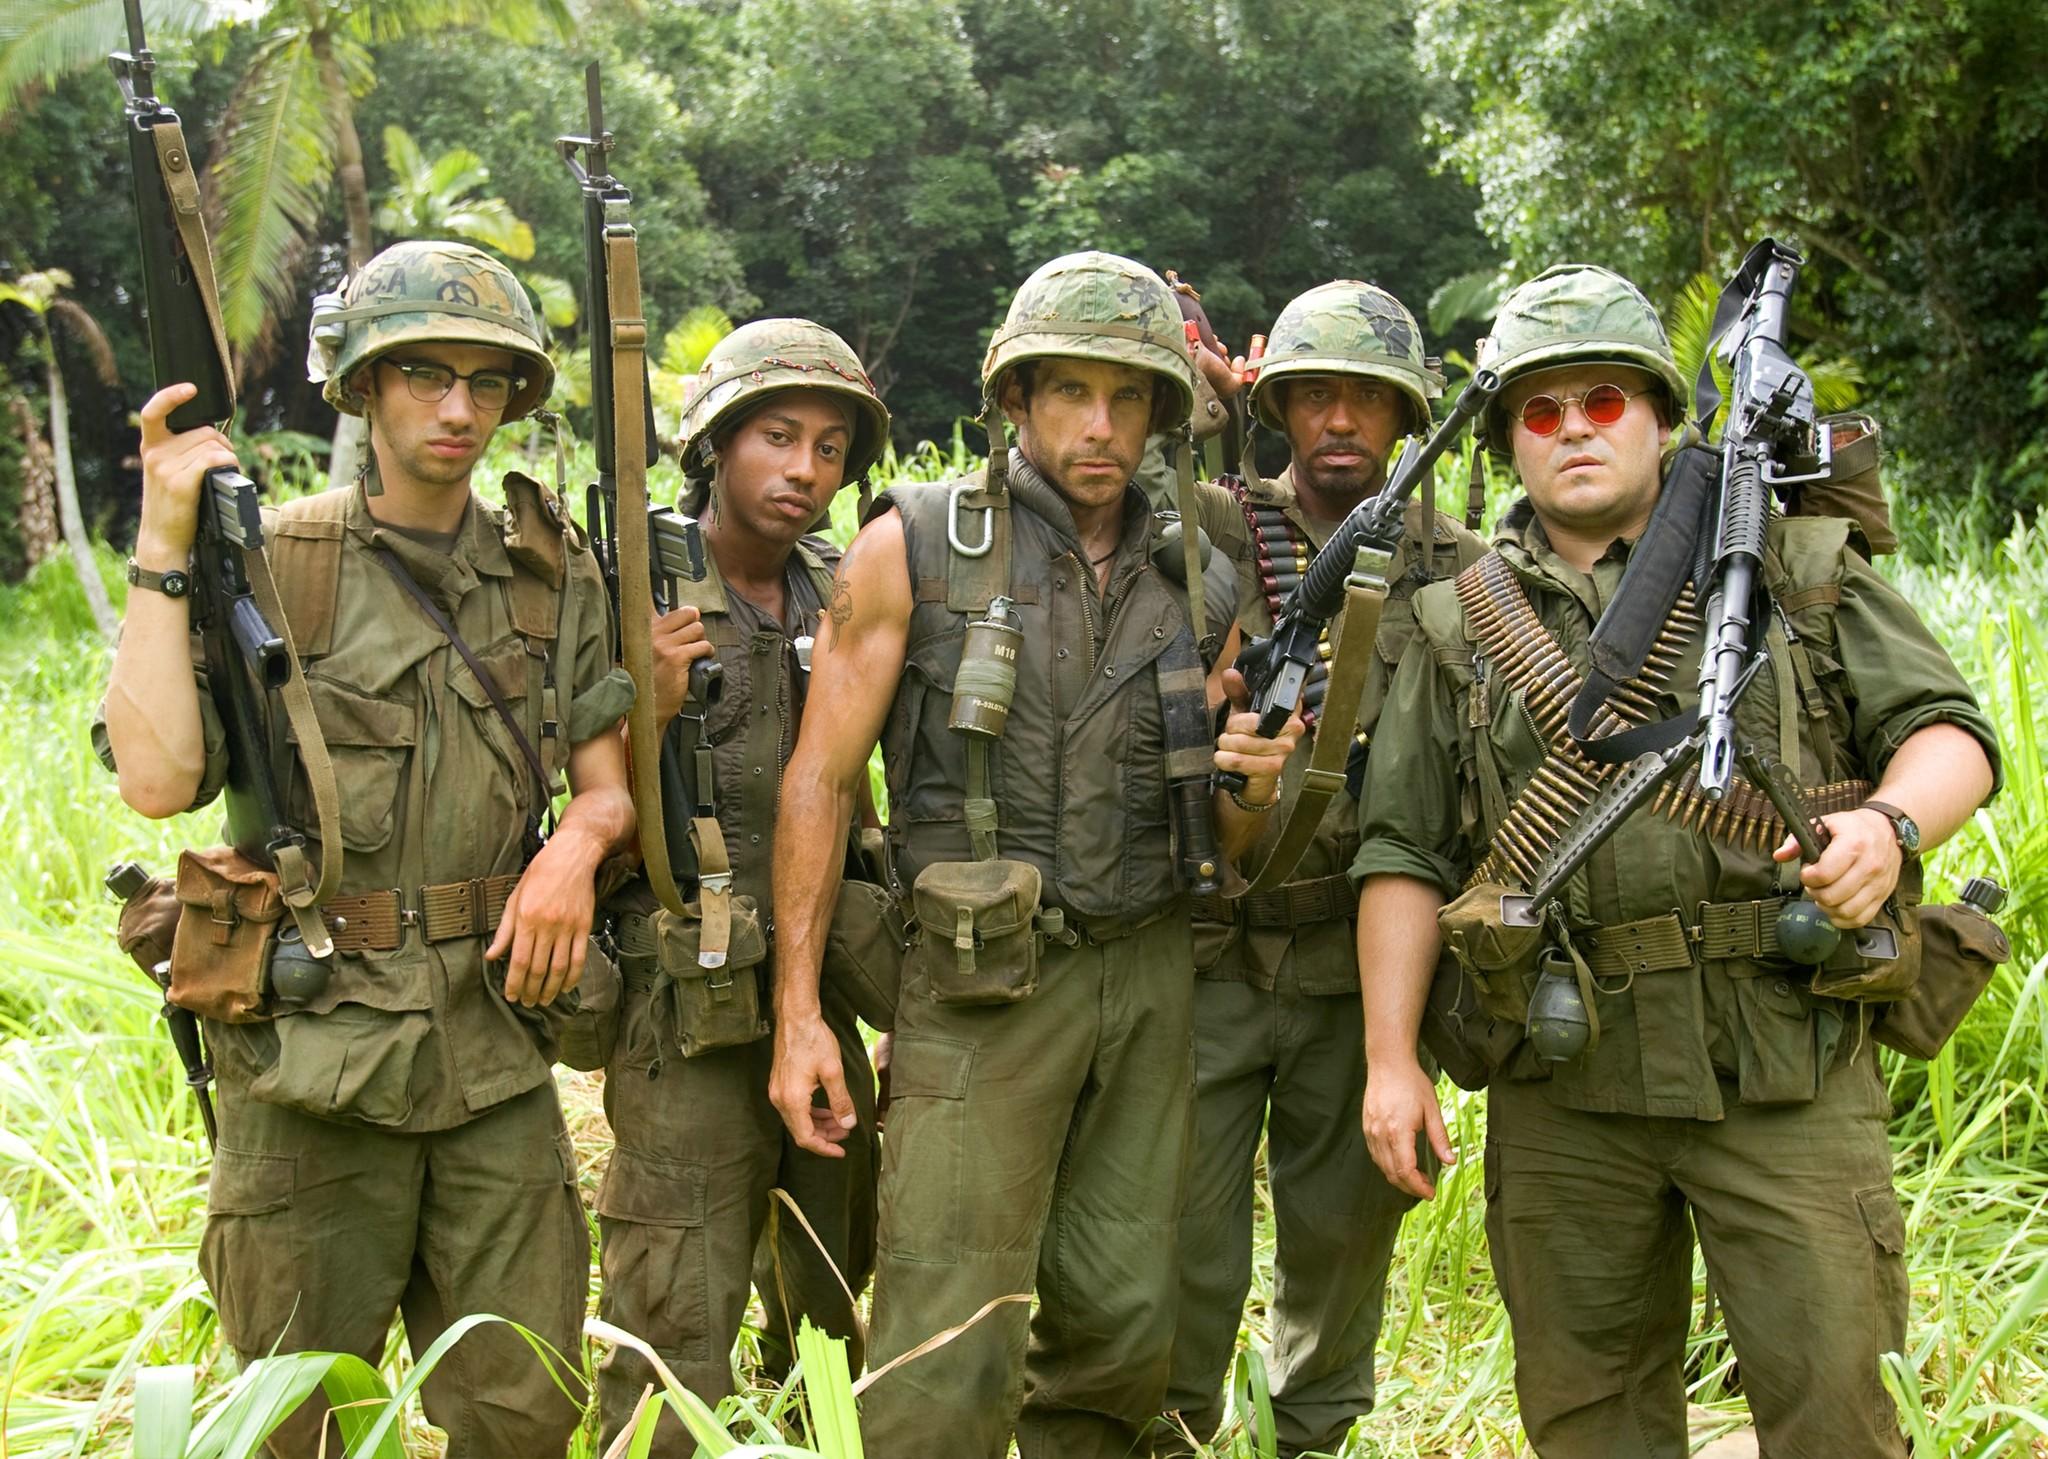 Robert Downey Jr., Ben Stiller, Jay Baruchel, Jack Black, and Brandon T. Jackson in Tropic Thunder (2008)